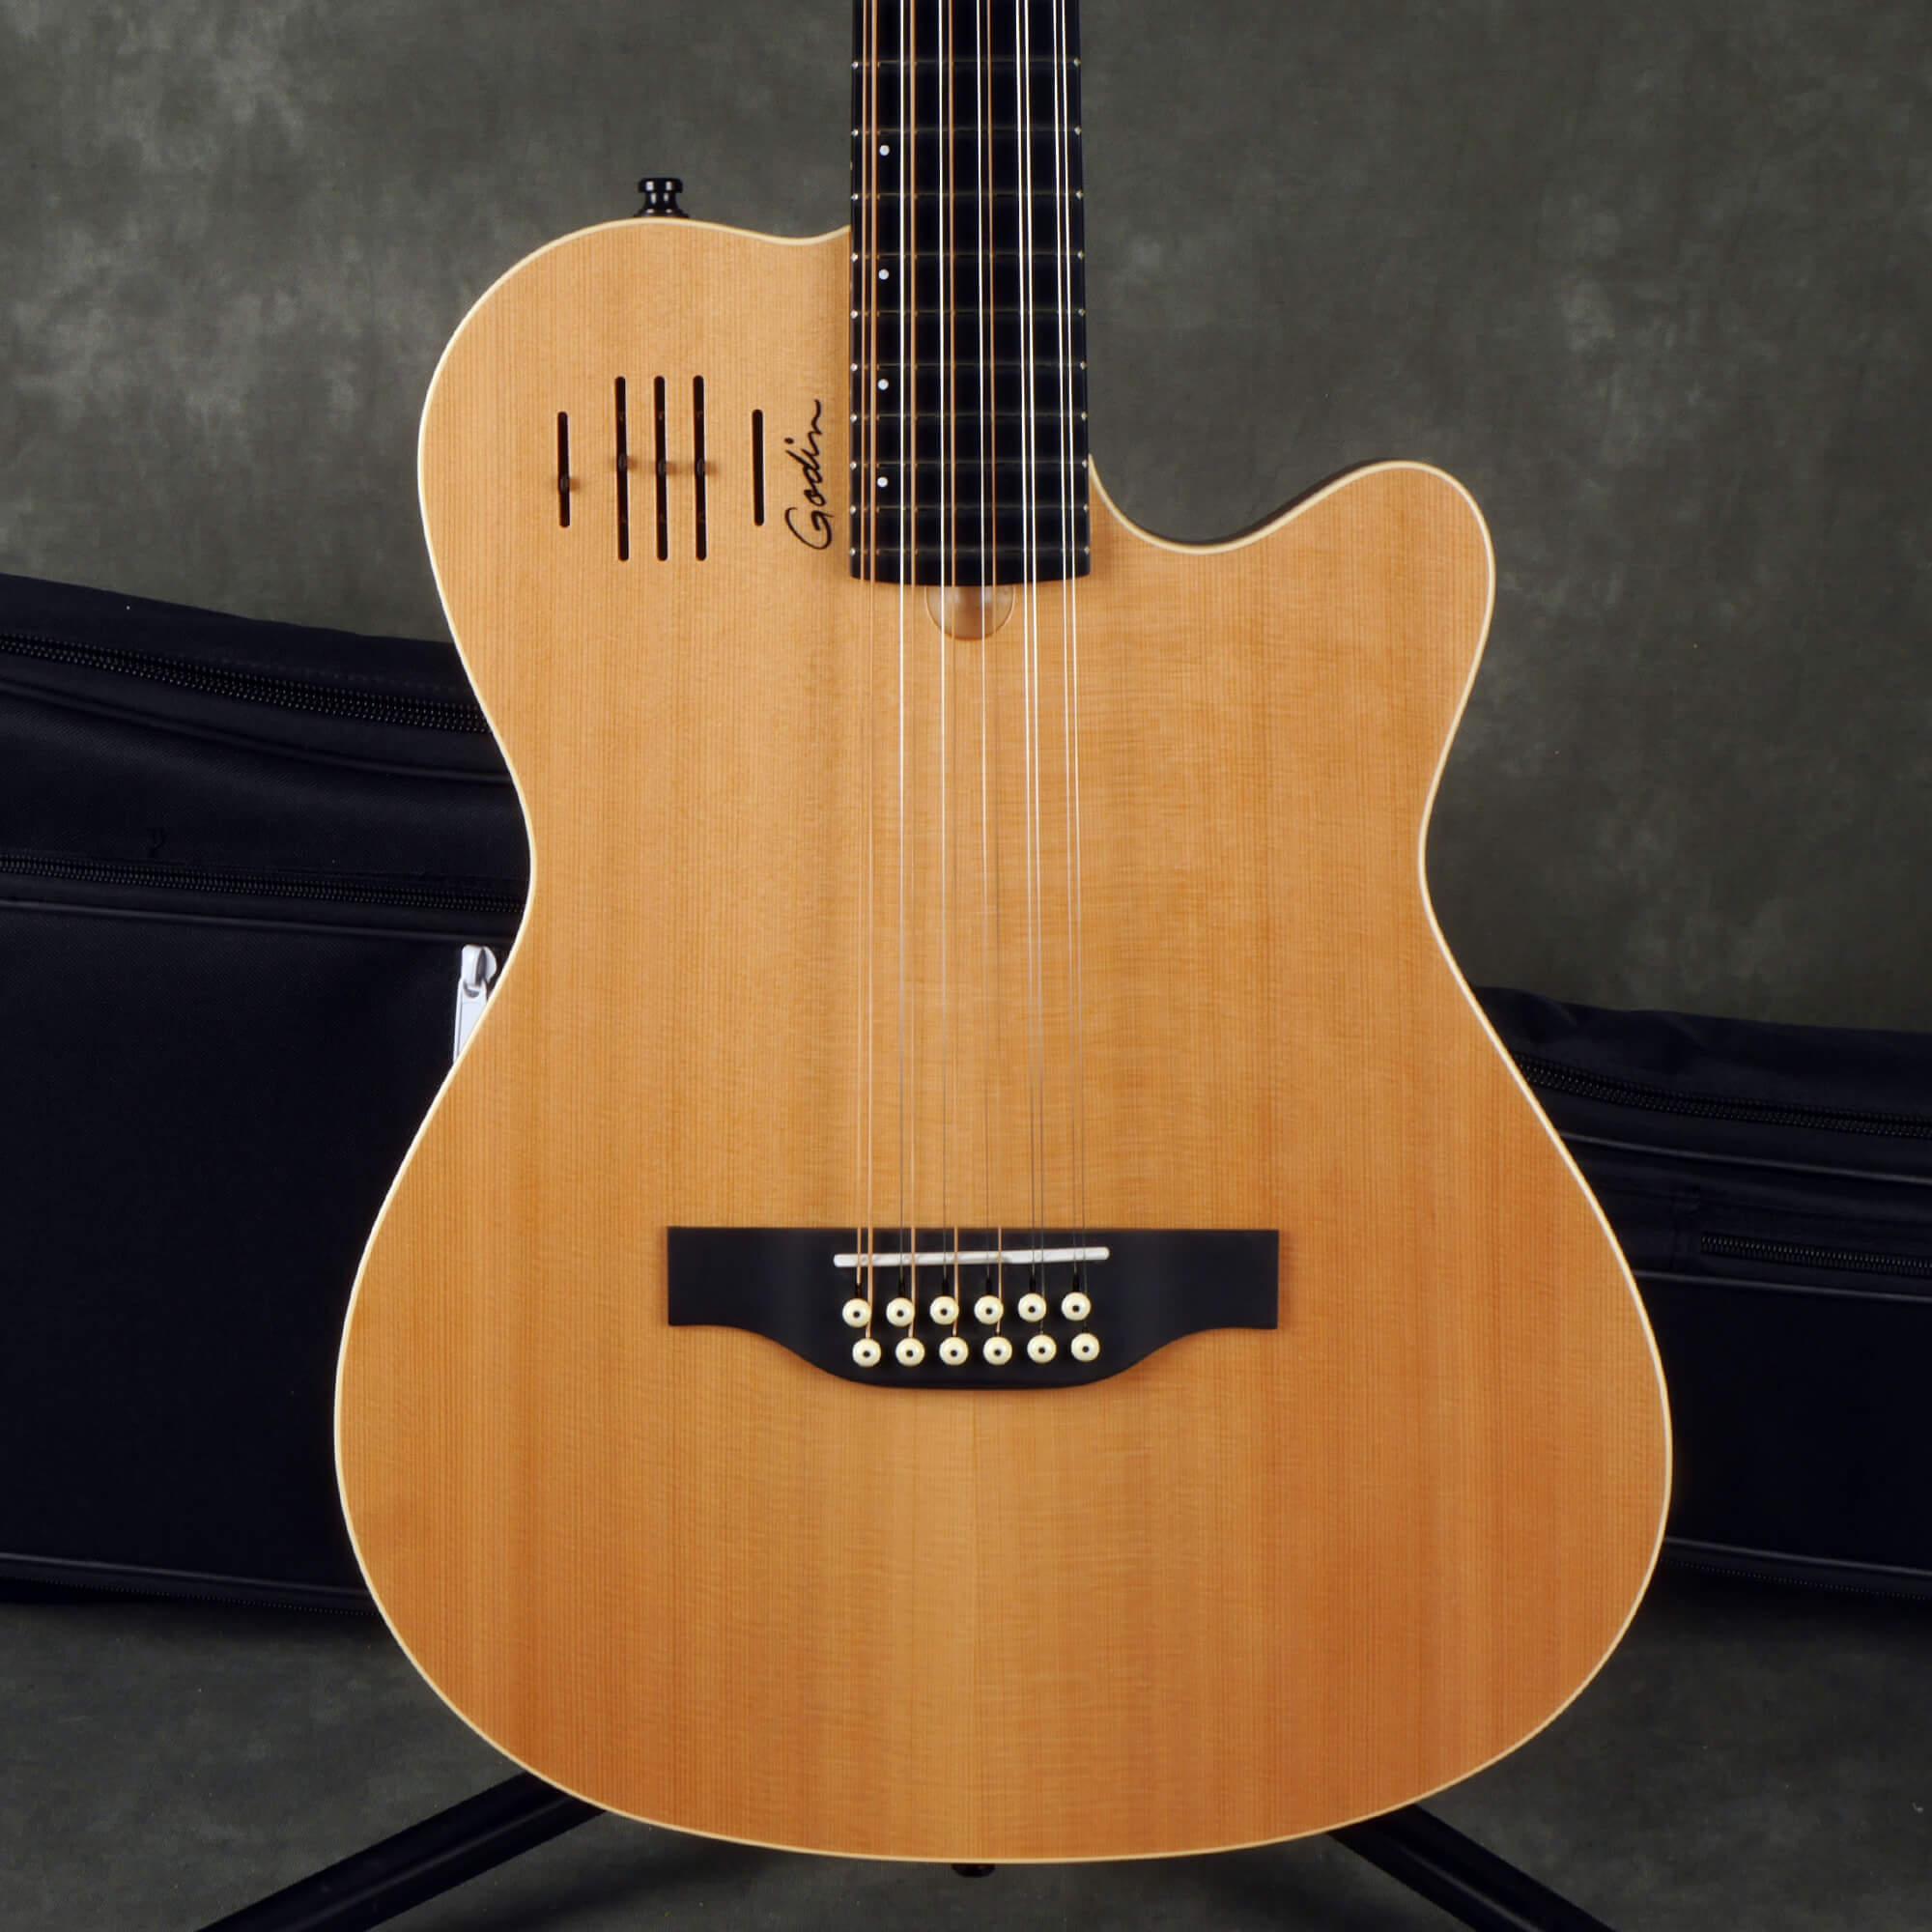 Godin A12 Natural SG 12-String Electric Guitar w/Gig Bag - 2nd Hand